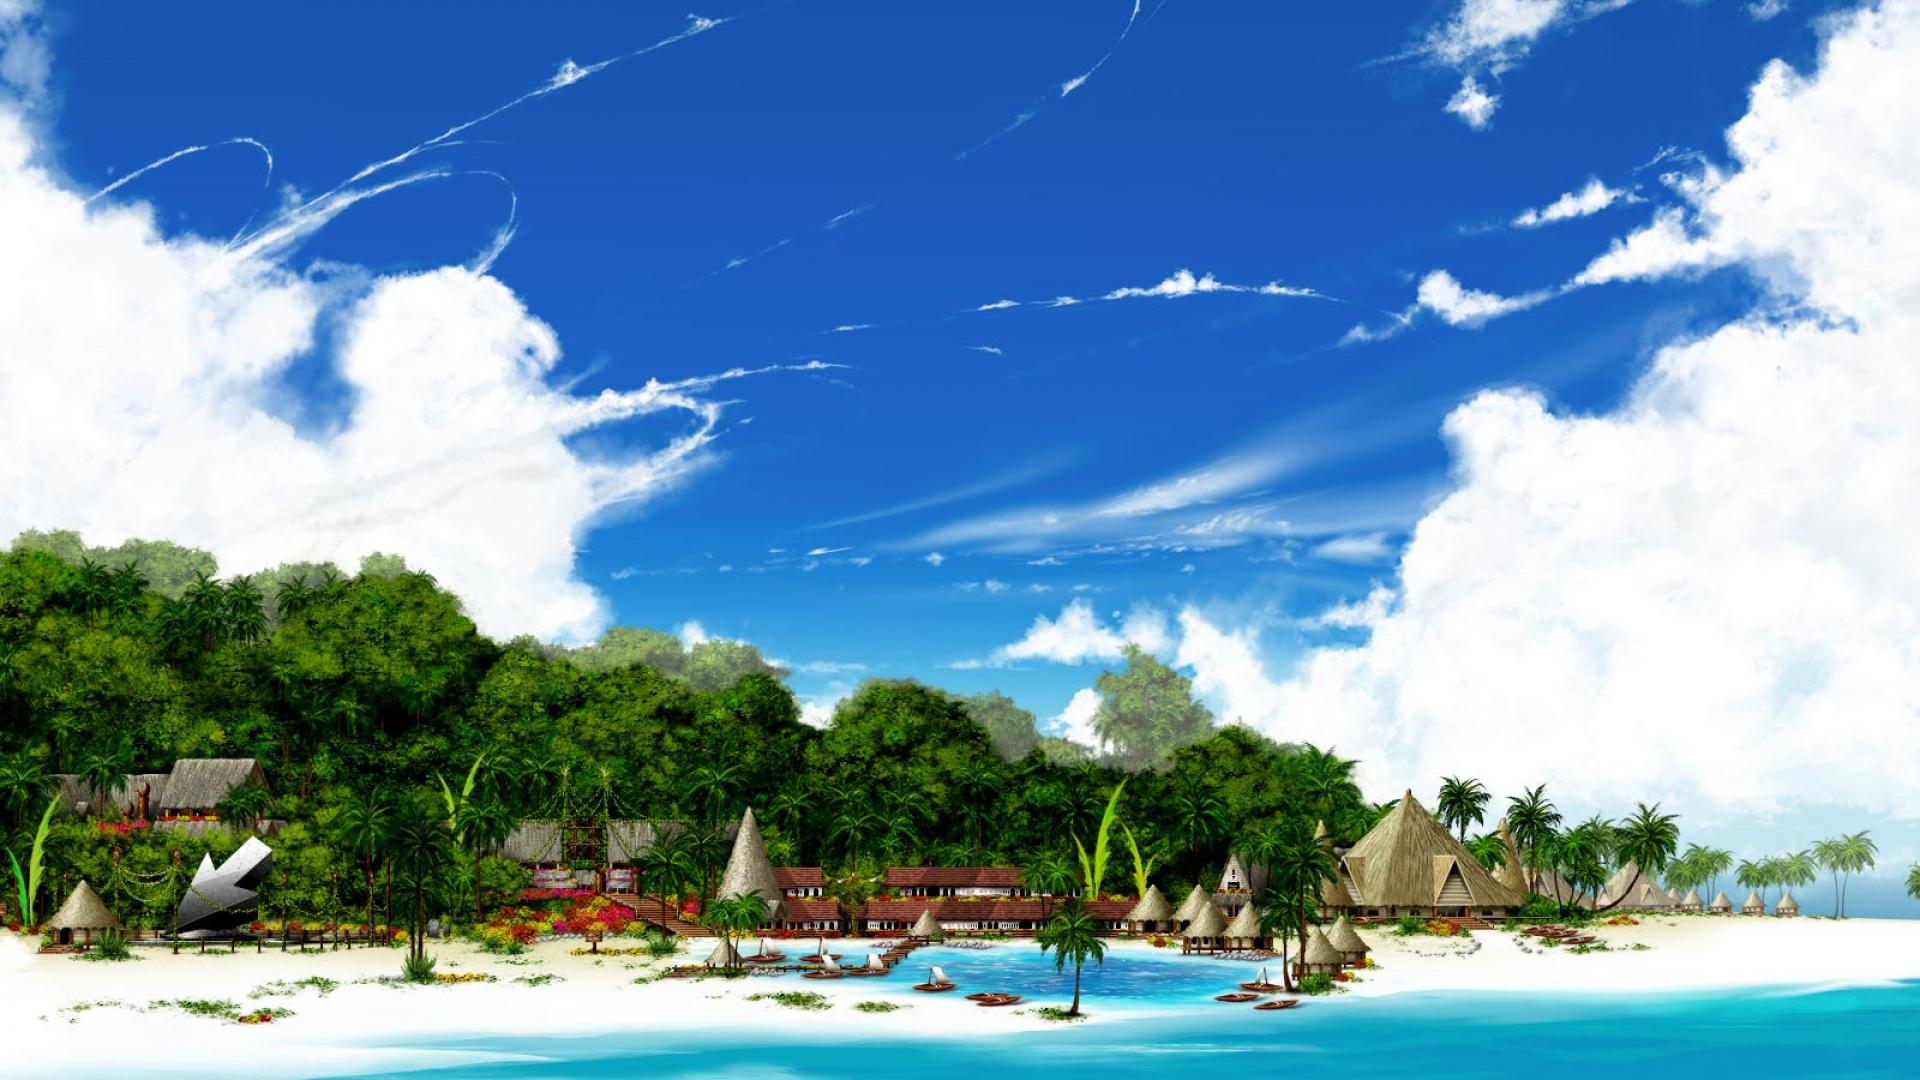 Download paradise beach wallpaper HD wallpaper 1920x1080